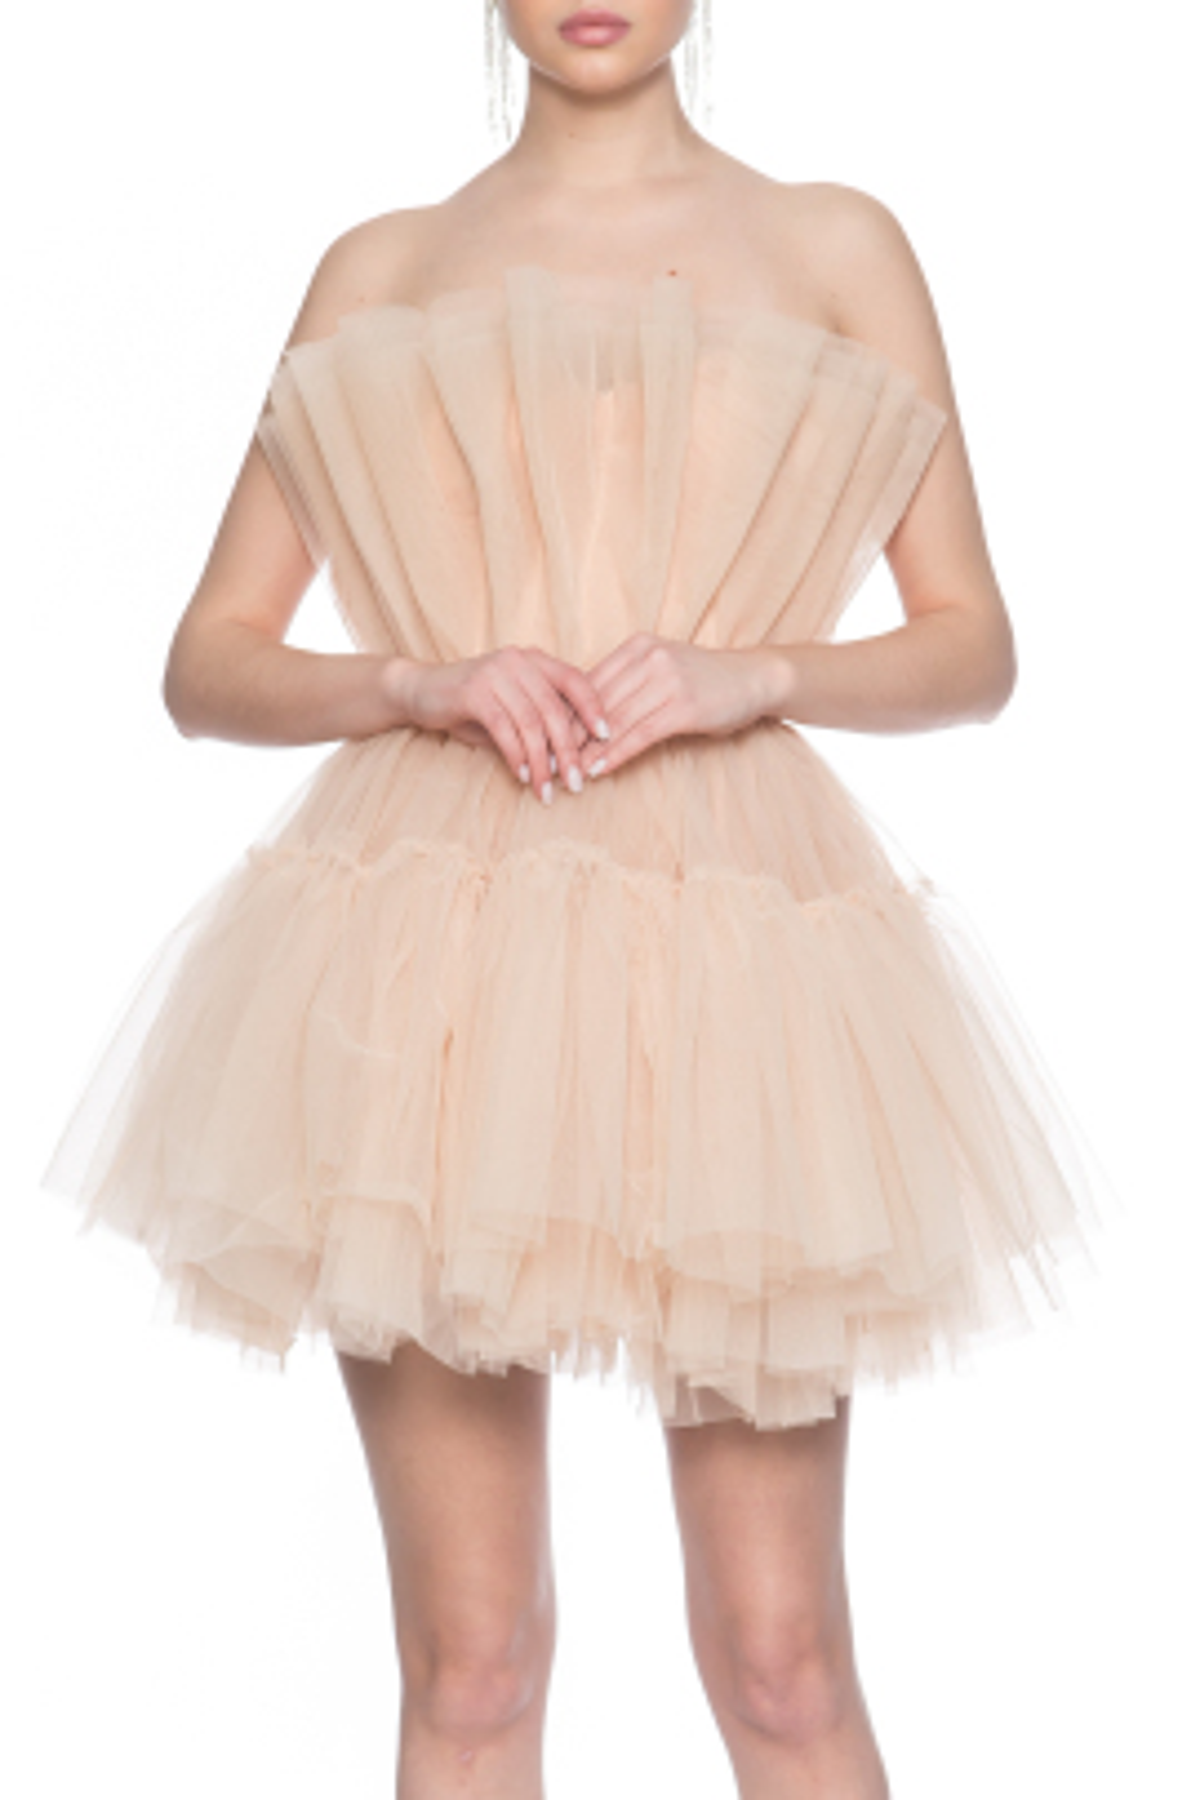 Gia Nude Tül Elbise